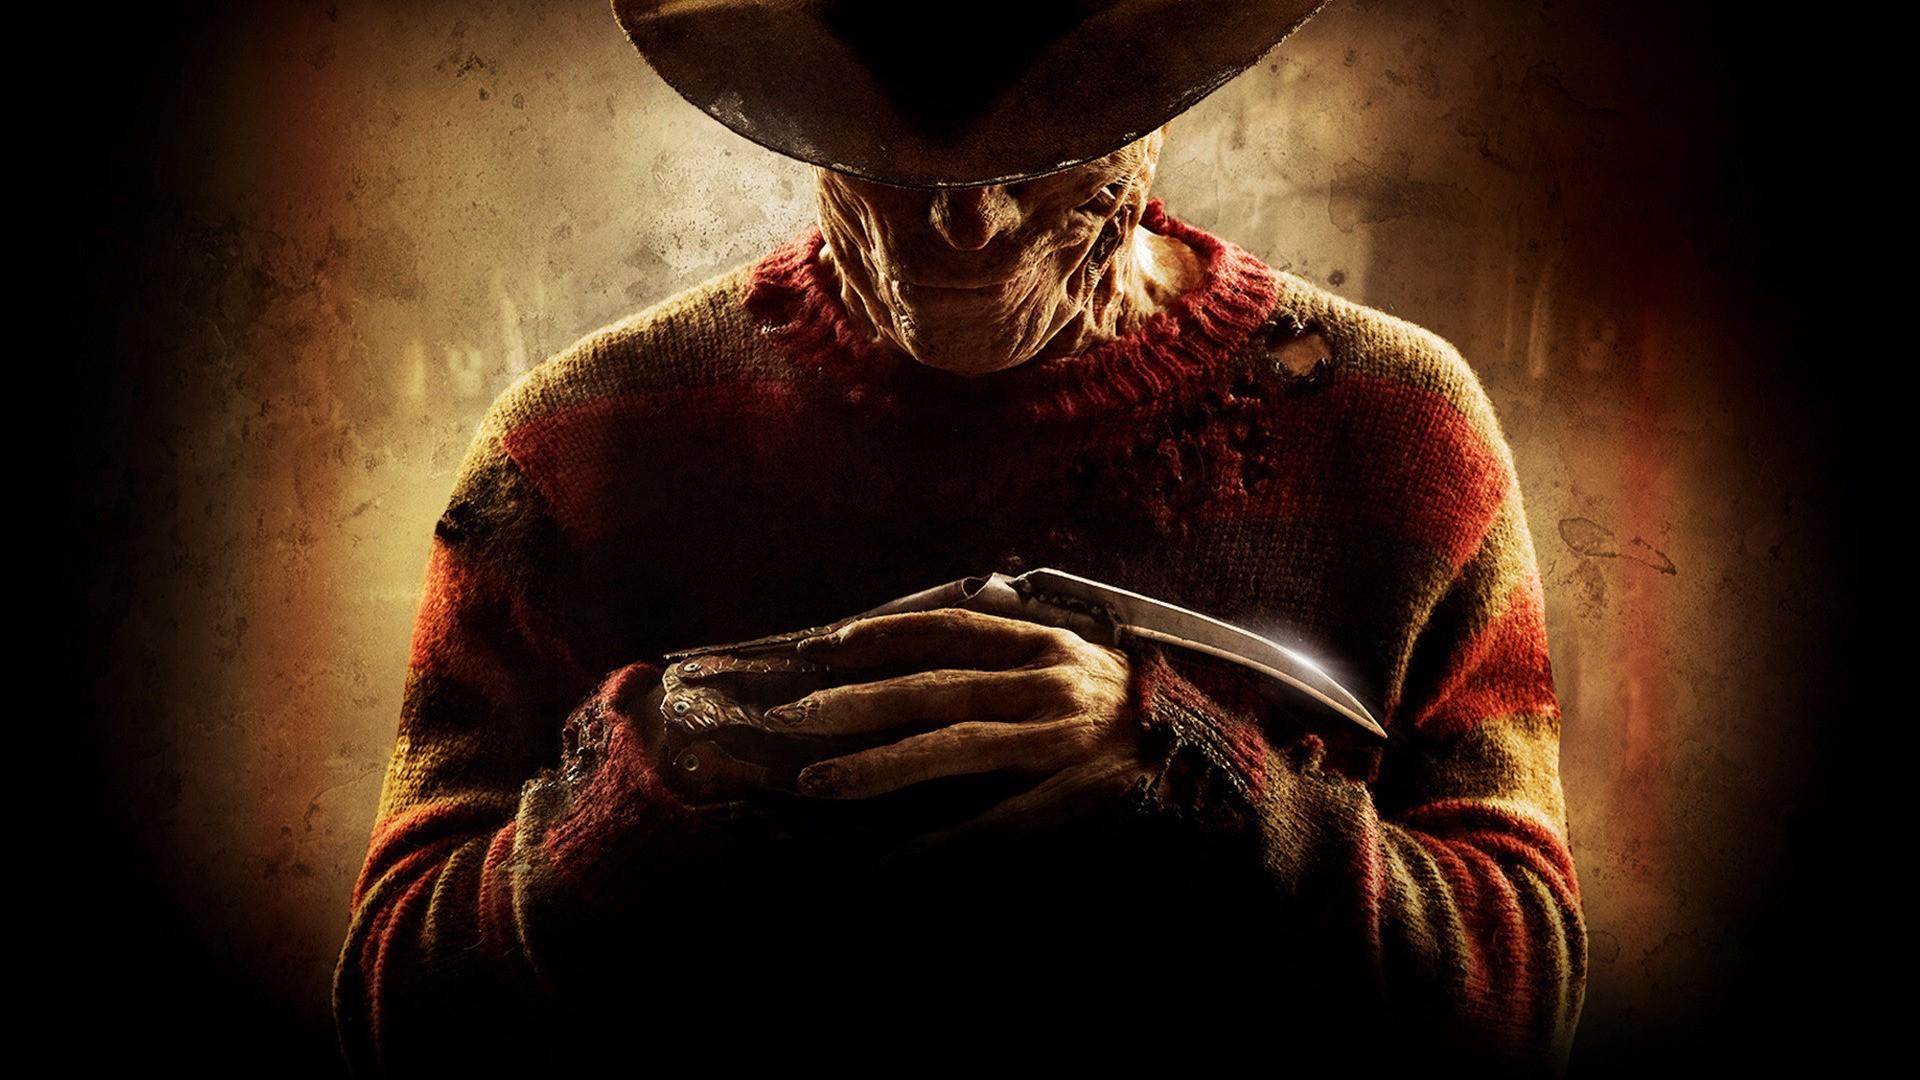 Freddy Krueger Hd Background